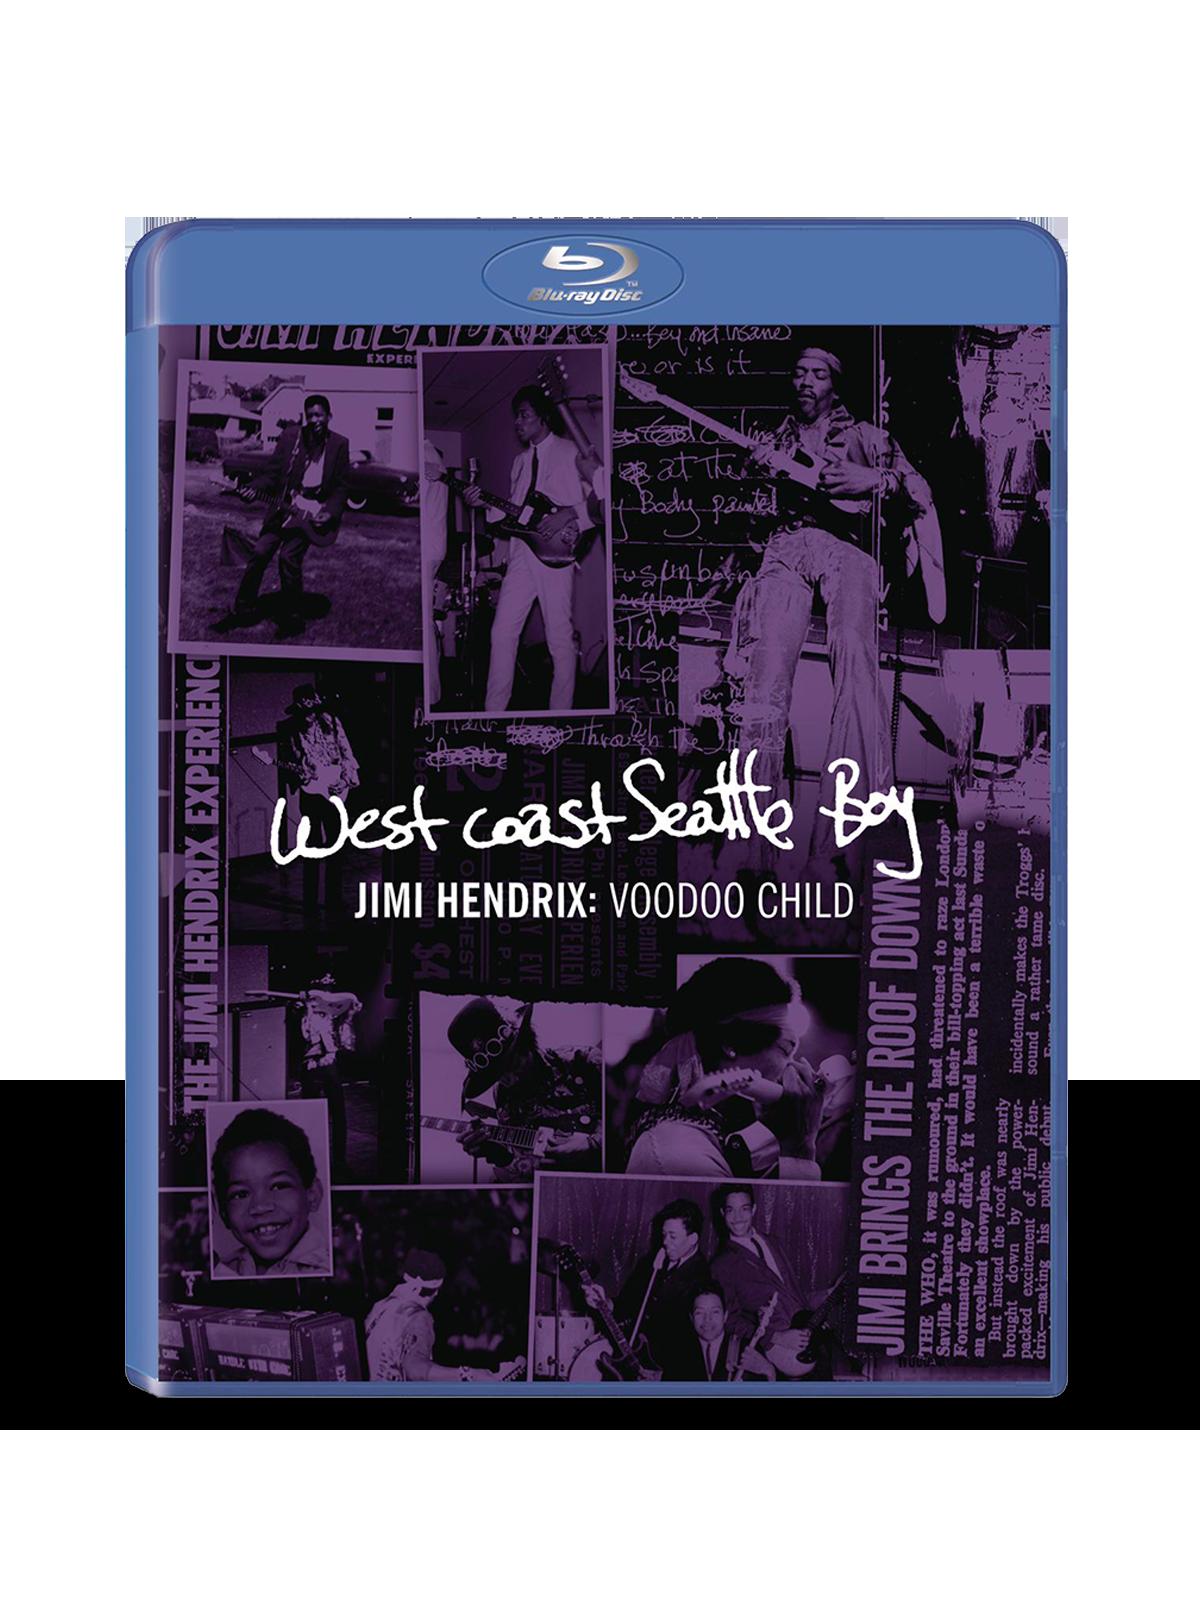 Jimi Hendrix: Voodoo Child Blu-Ray DVD